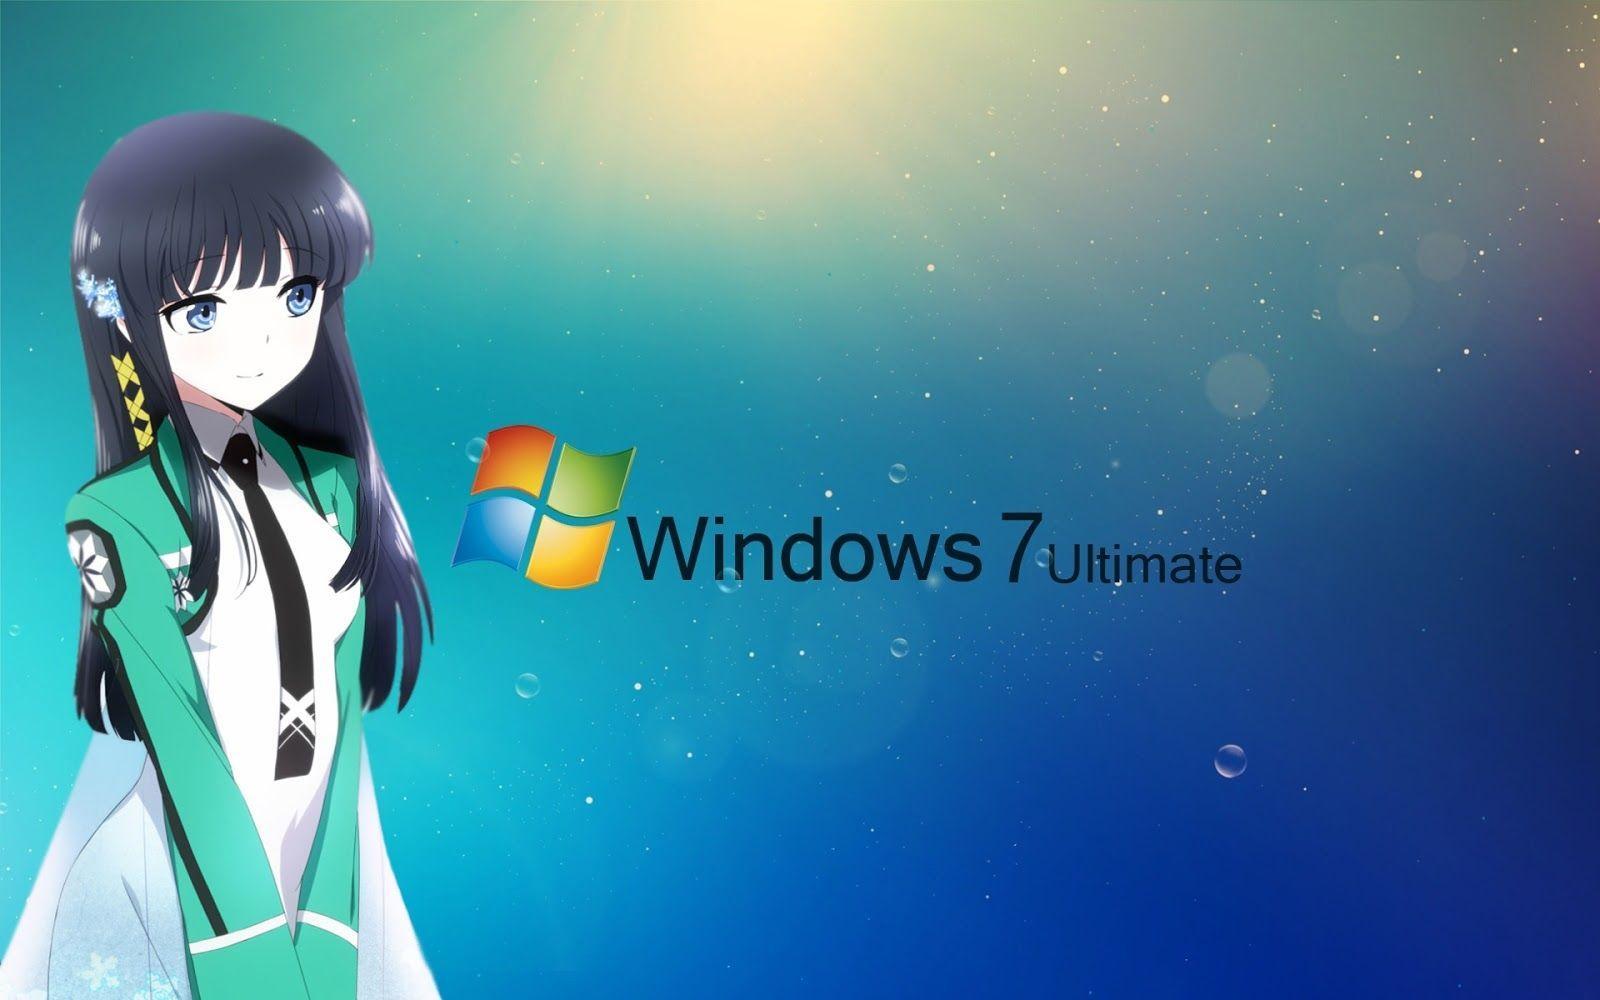 fondos anime windows: Windows Anime Wallpapers